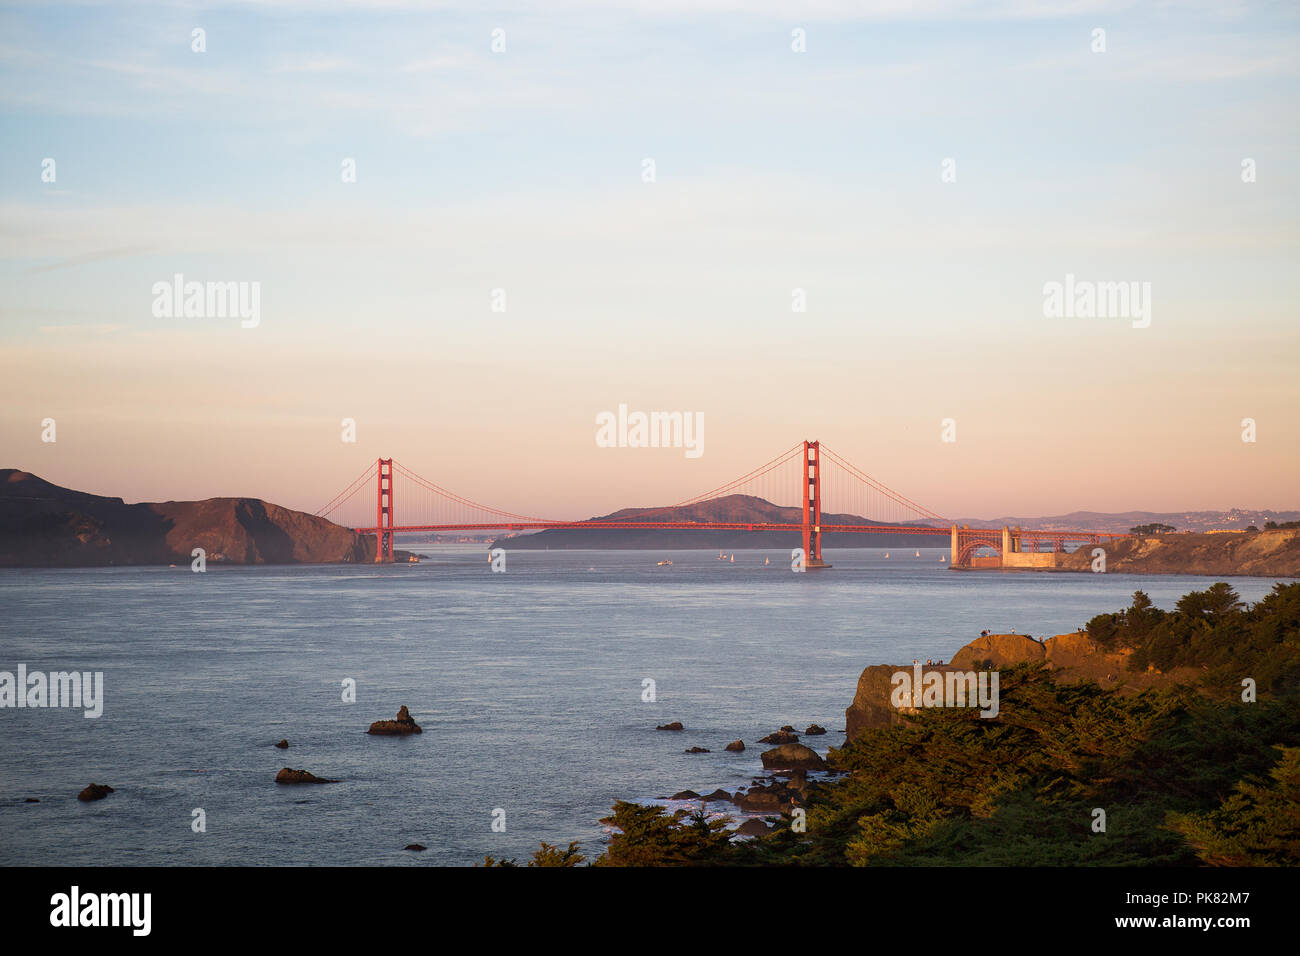 Golden Gate Bridge at Sunset - Stock Image